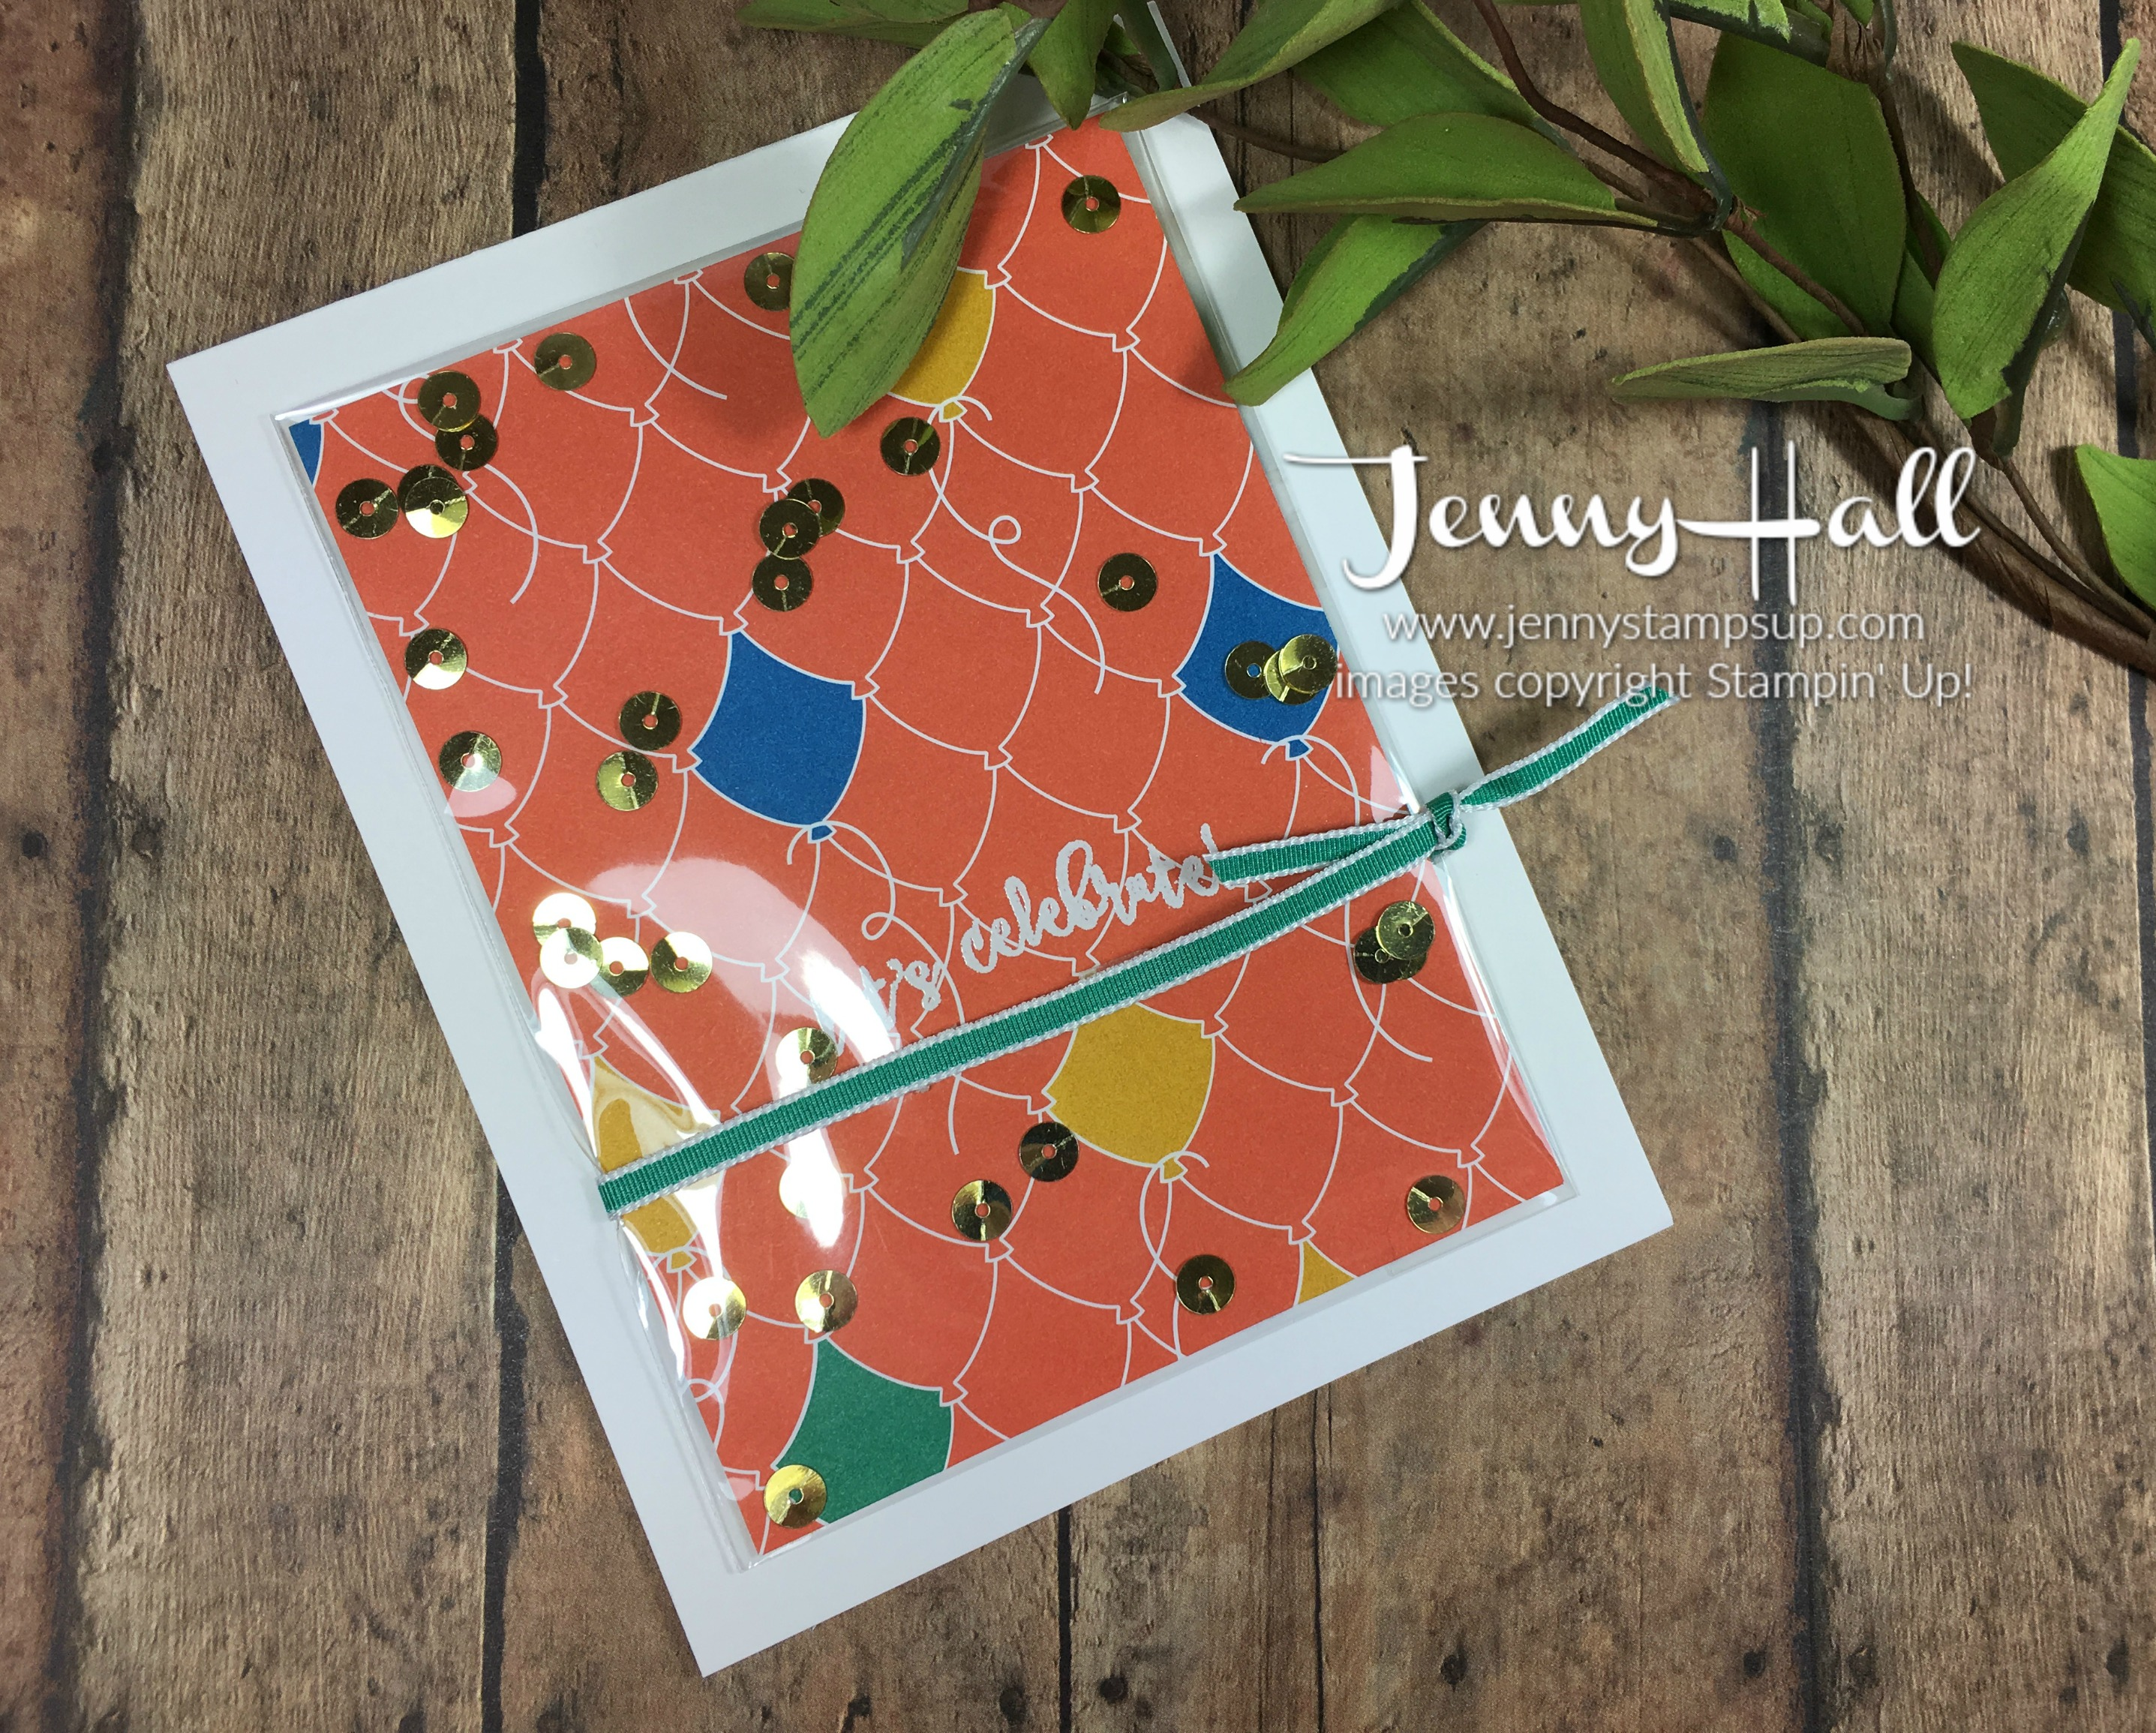 Simple shaker card by Jenny Hall www.jennyhalldesign.com